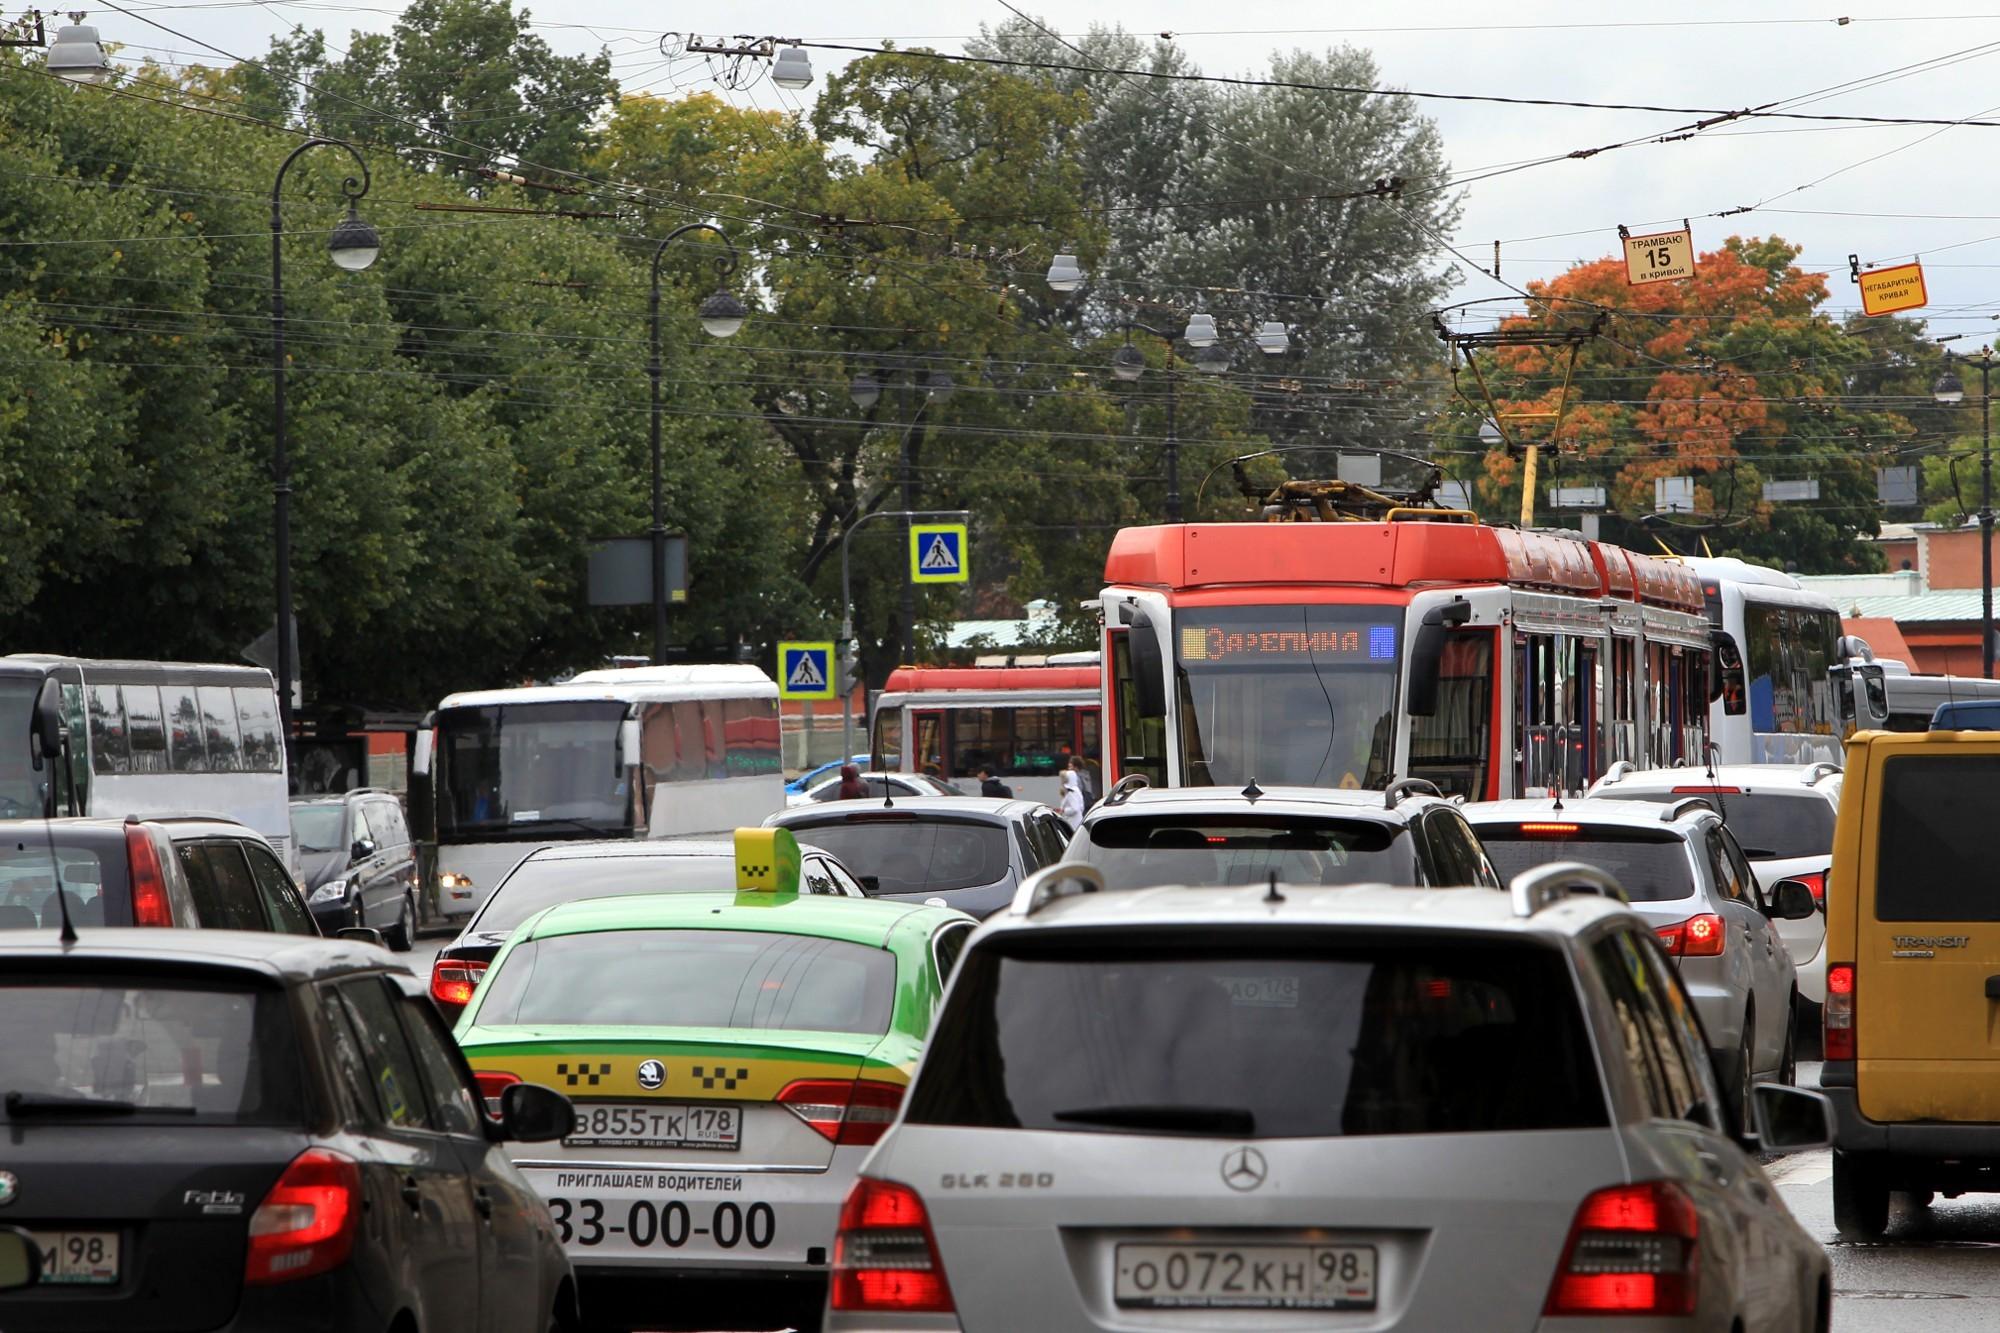 улица куйбышева челночный трамвай 3а пробка